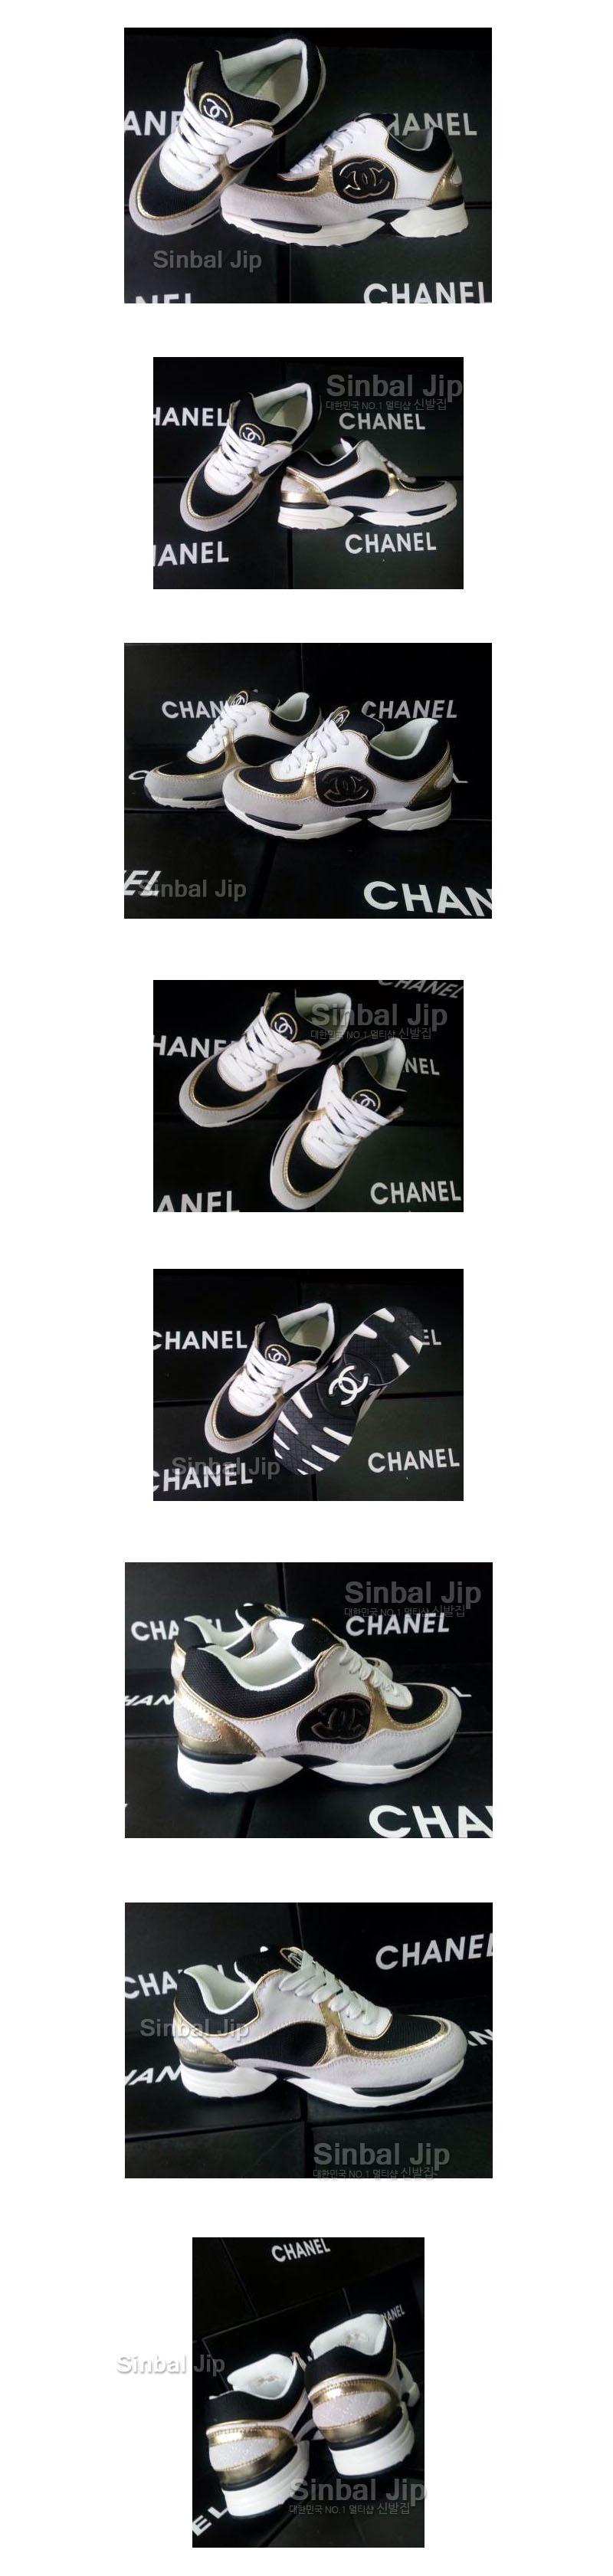 8d1ca055c2c 세상 모든신발 최저가 판매 ==> 신발집.net : [CHANEL]샤넬 크루즈 스니커즈 검금